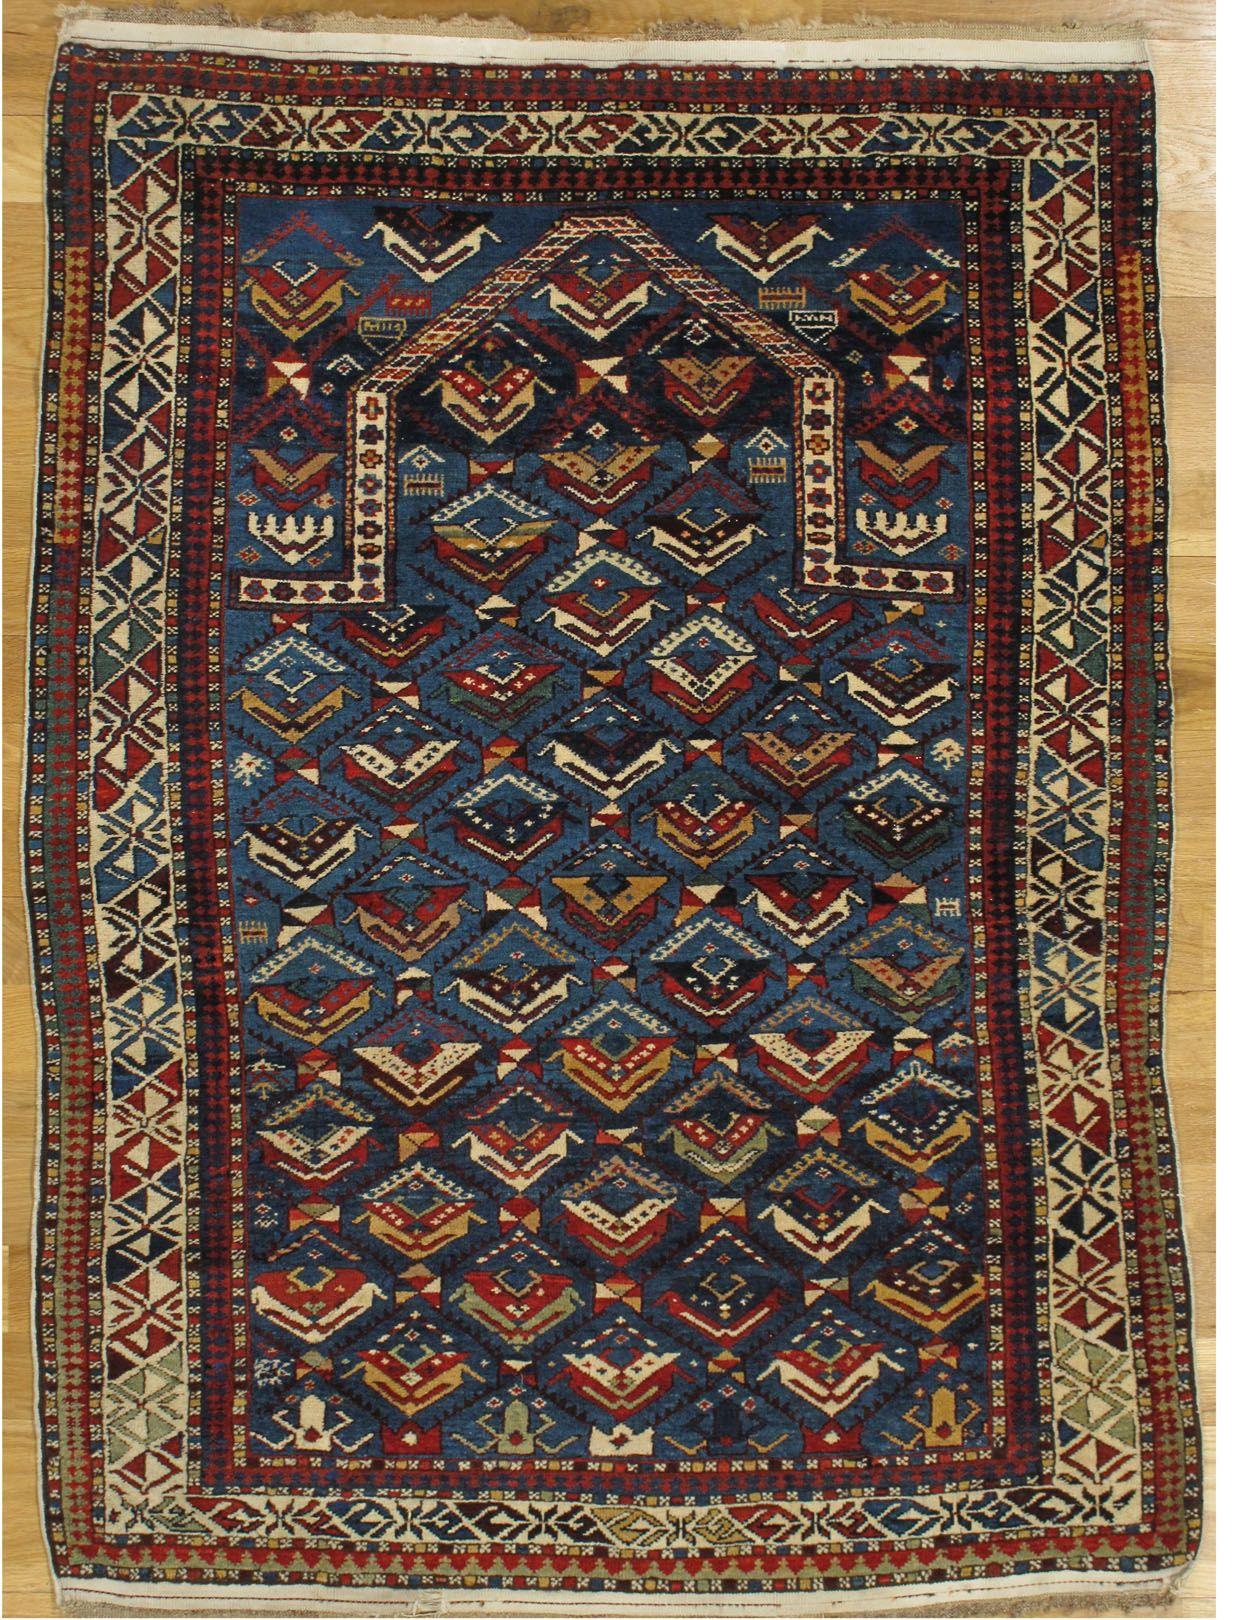 Shirvan Prayer Rug From Eastern Caucasus Age Circa 1875 Size 4